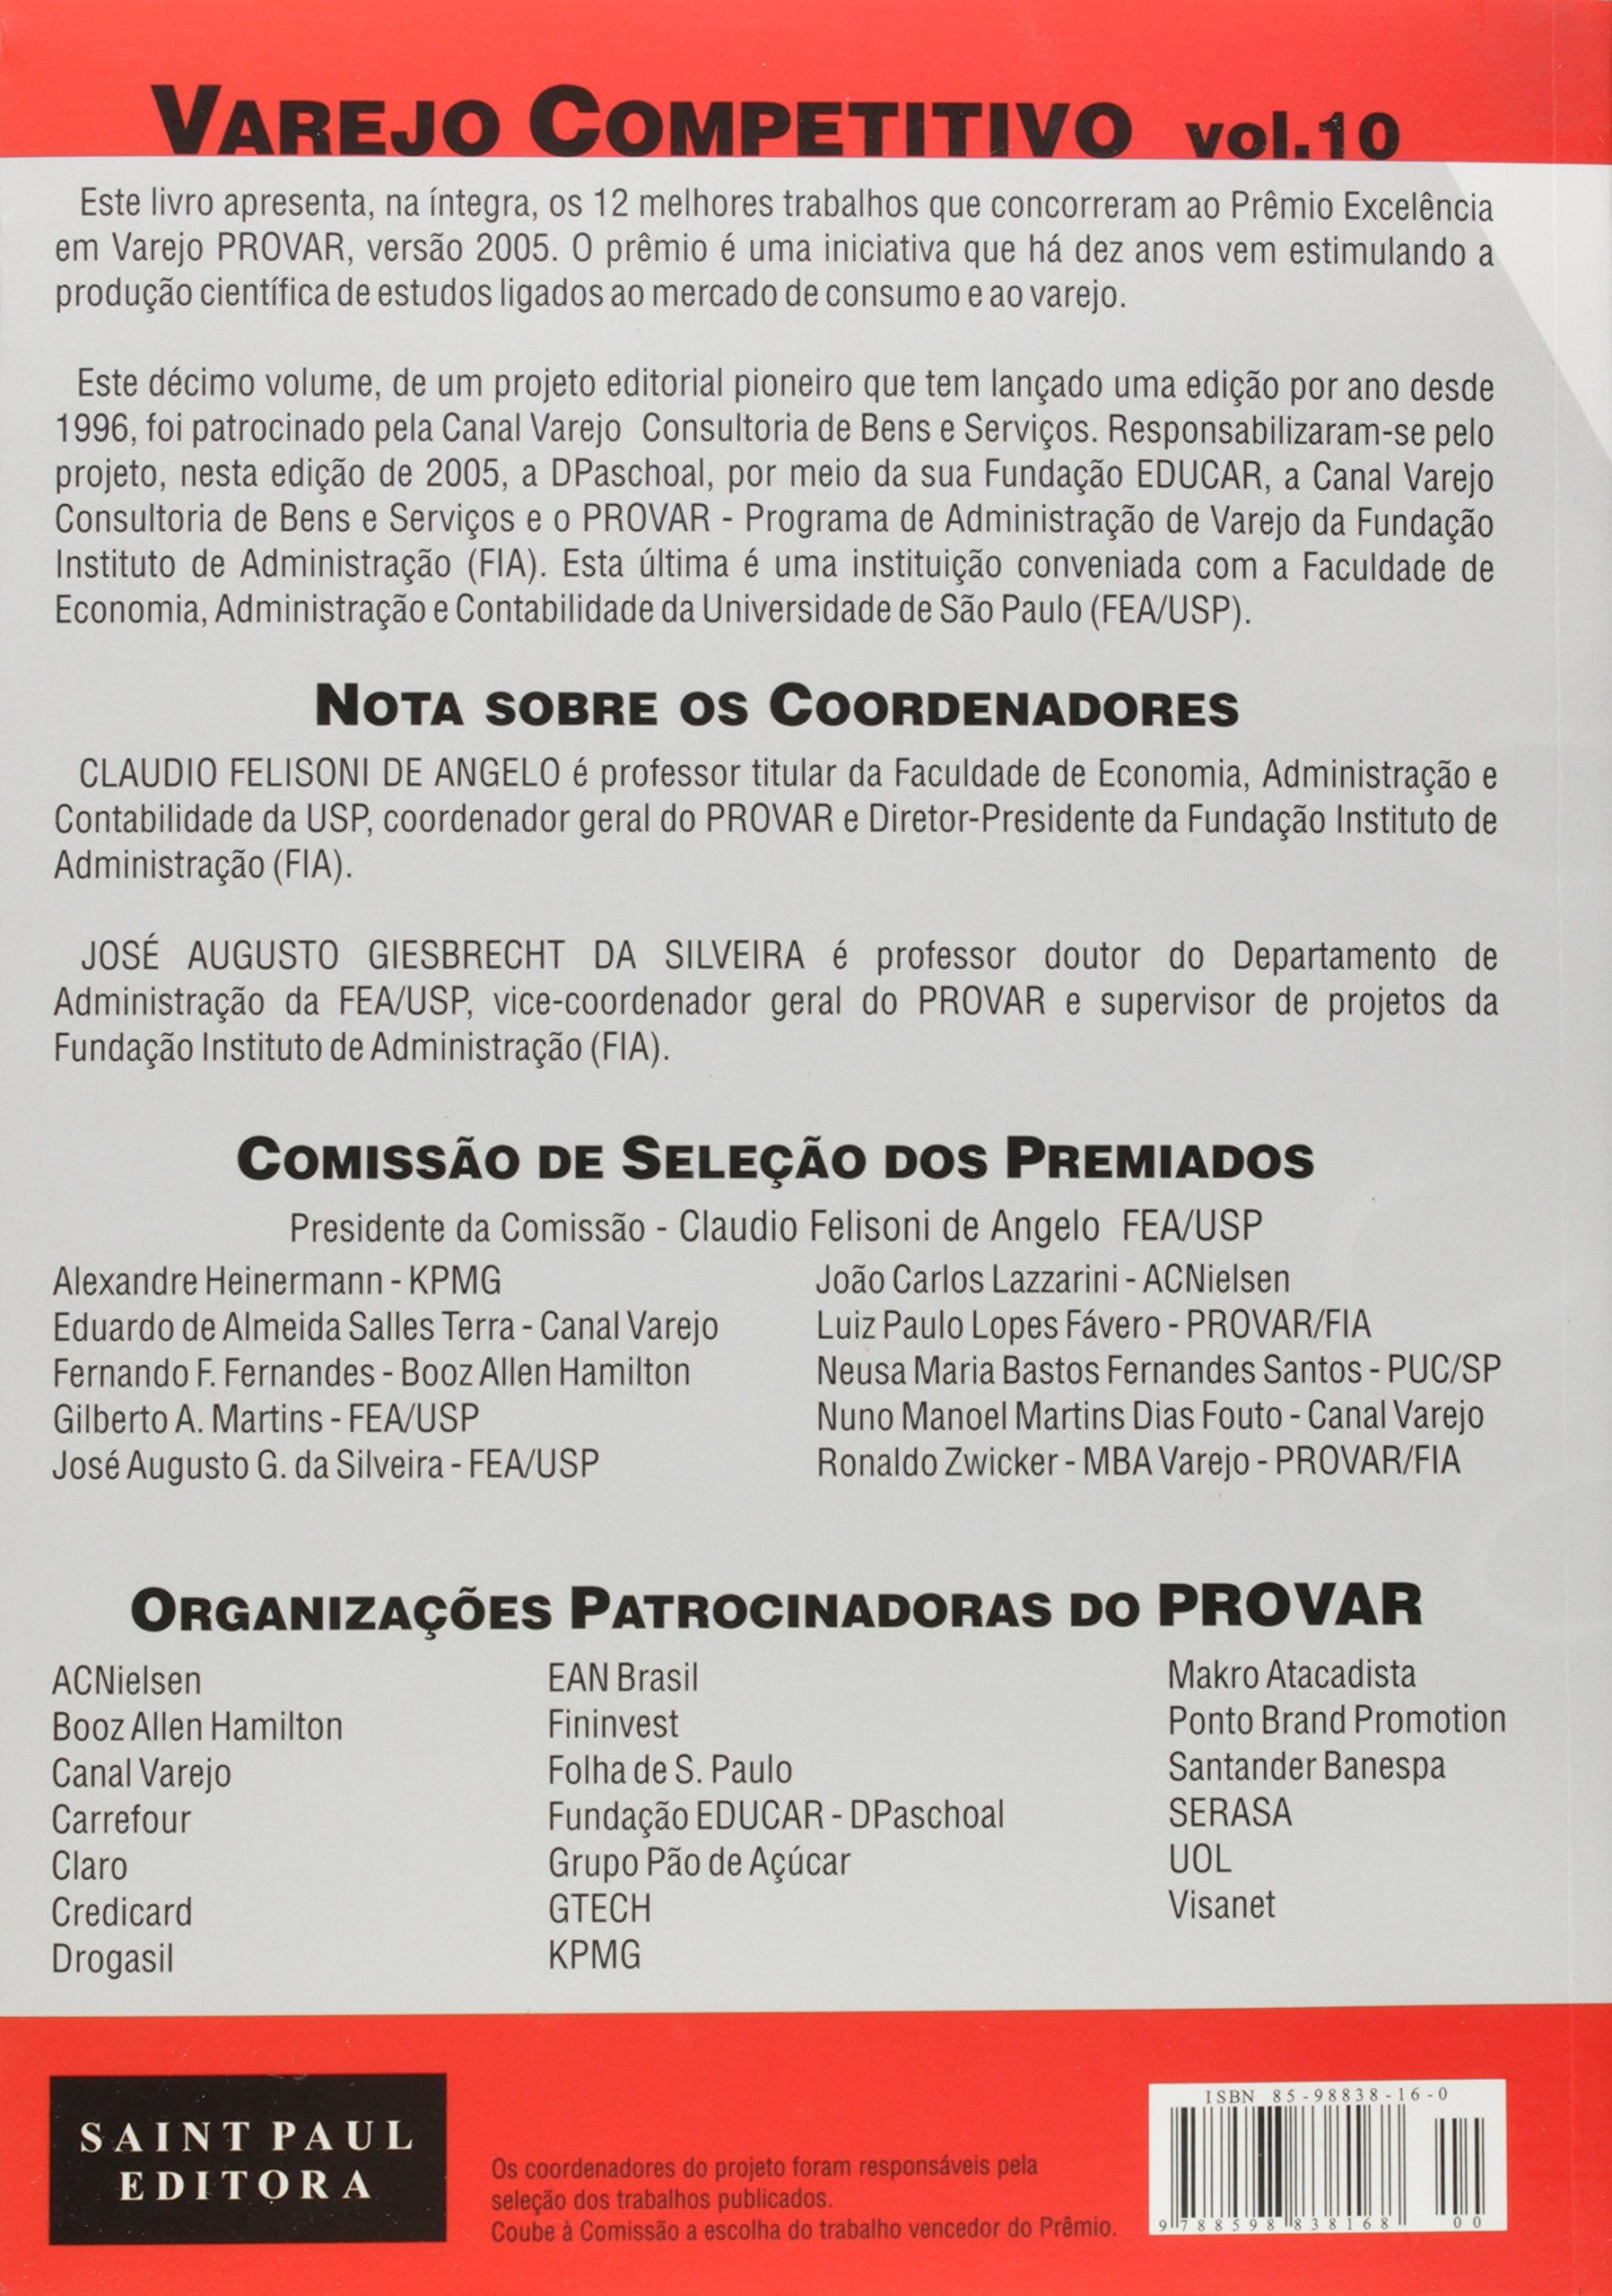 Varejo Competitivo - Volume 10: Claudio Felisone de Angelo: 9788598838168: Amazon.com: Books